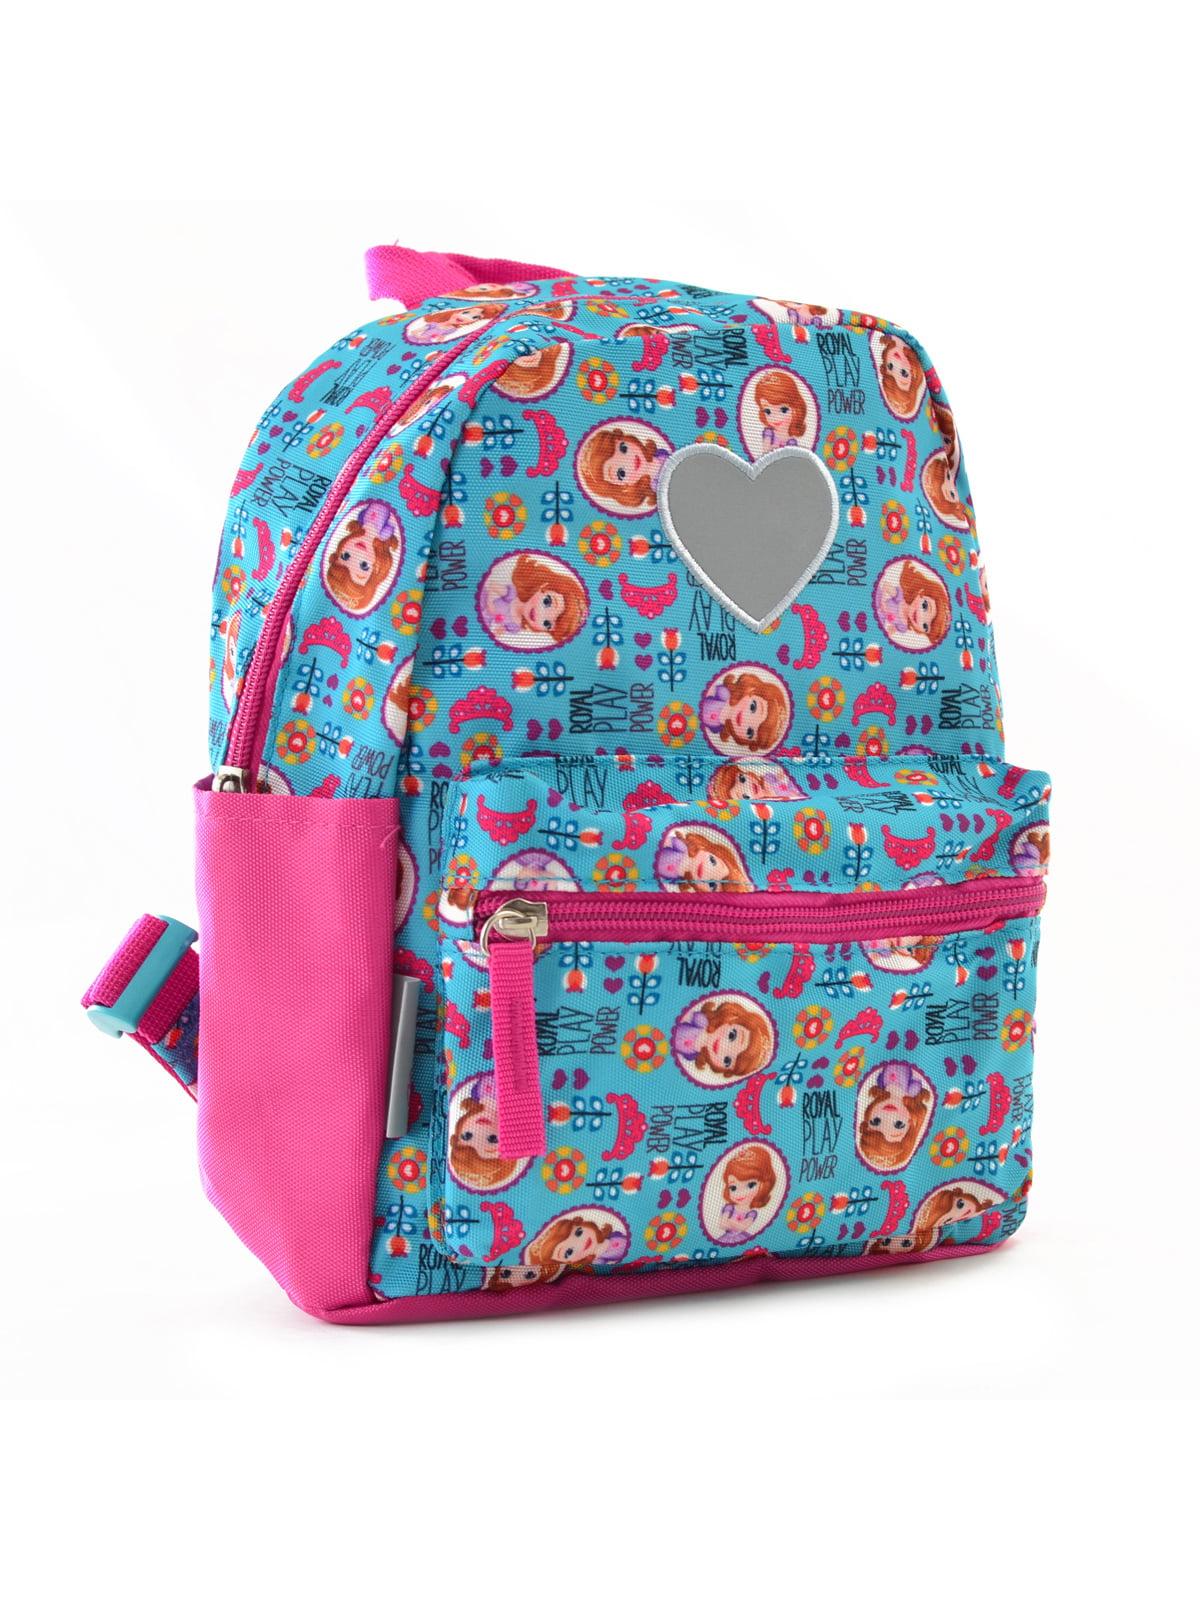 Рюкзак дитячий рожево-блакитний з принтом | 4284717